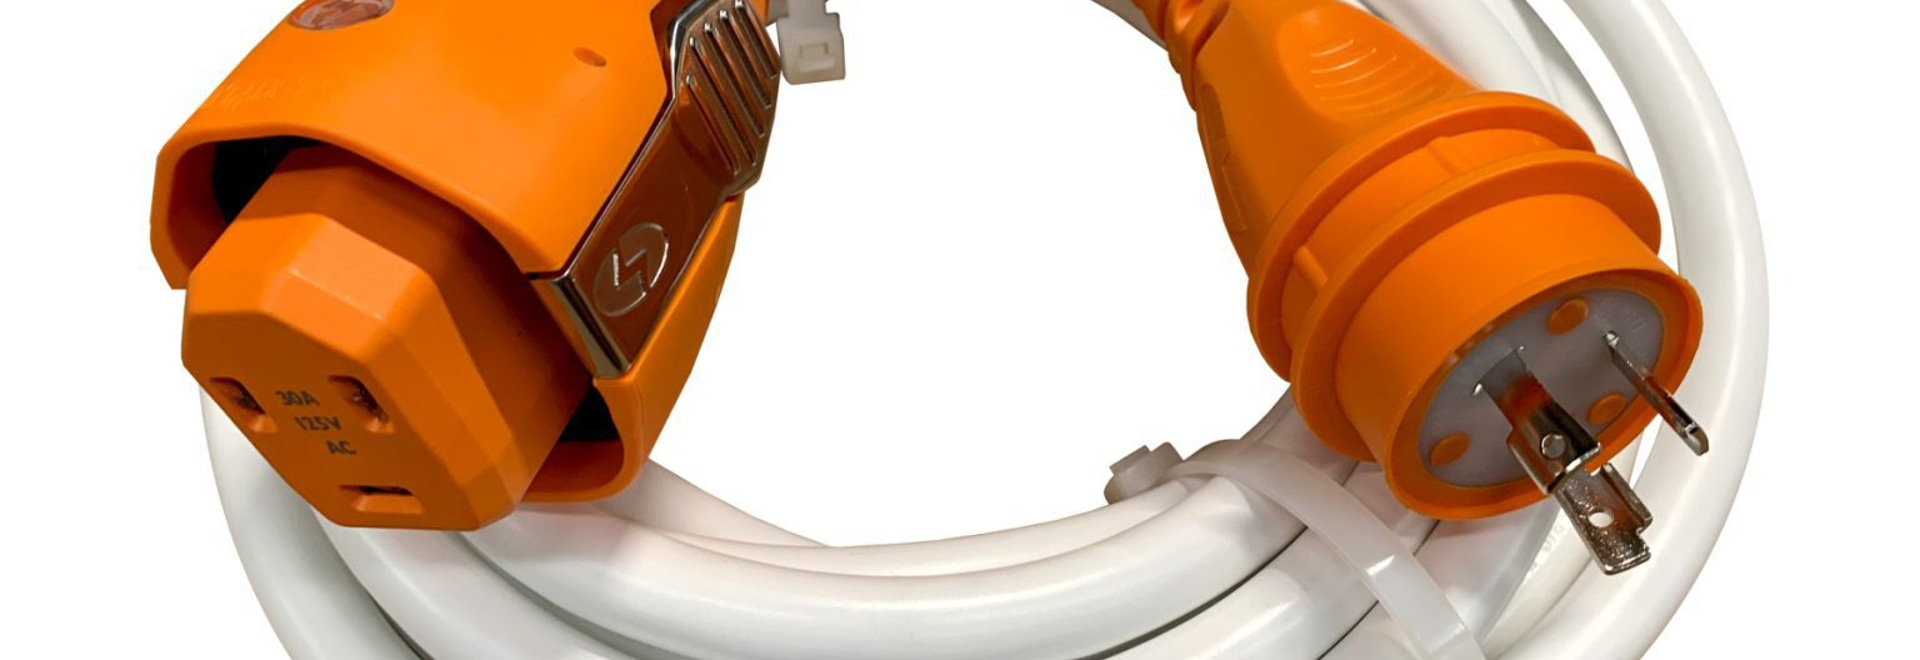 SmartPlug Debuts White 30A Cordsets